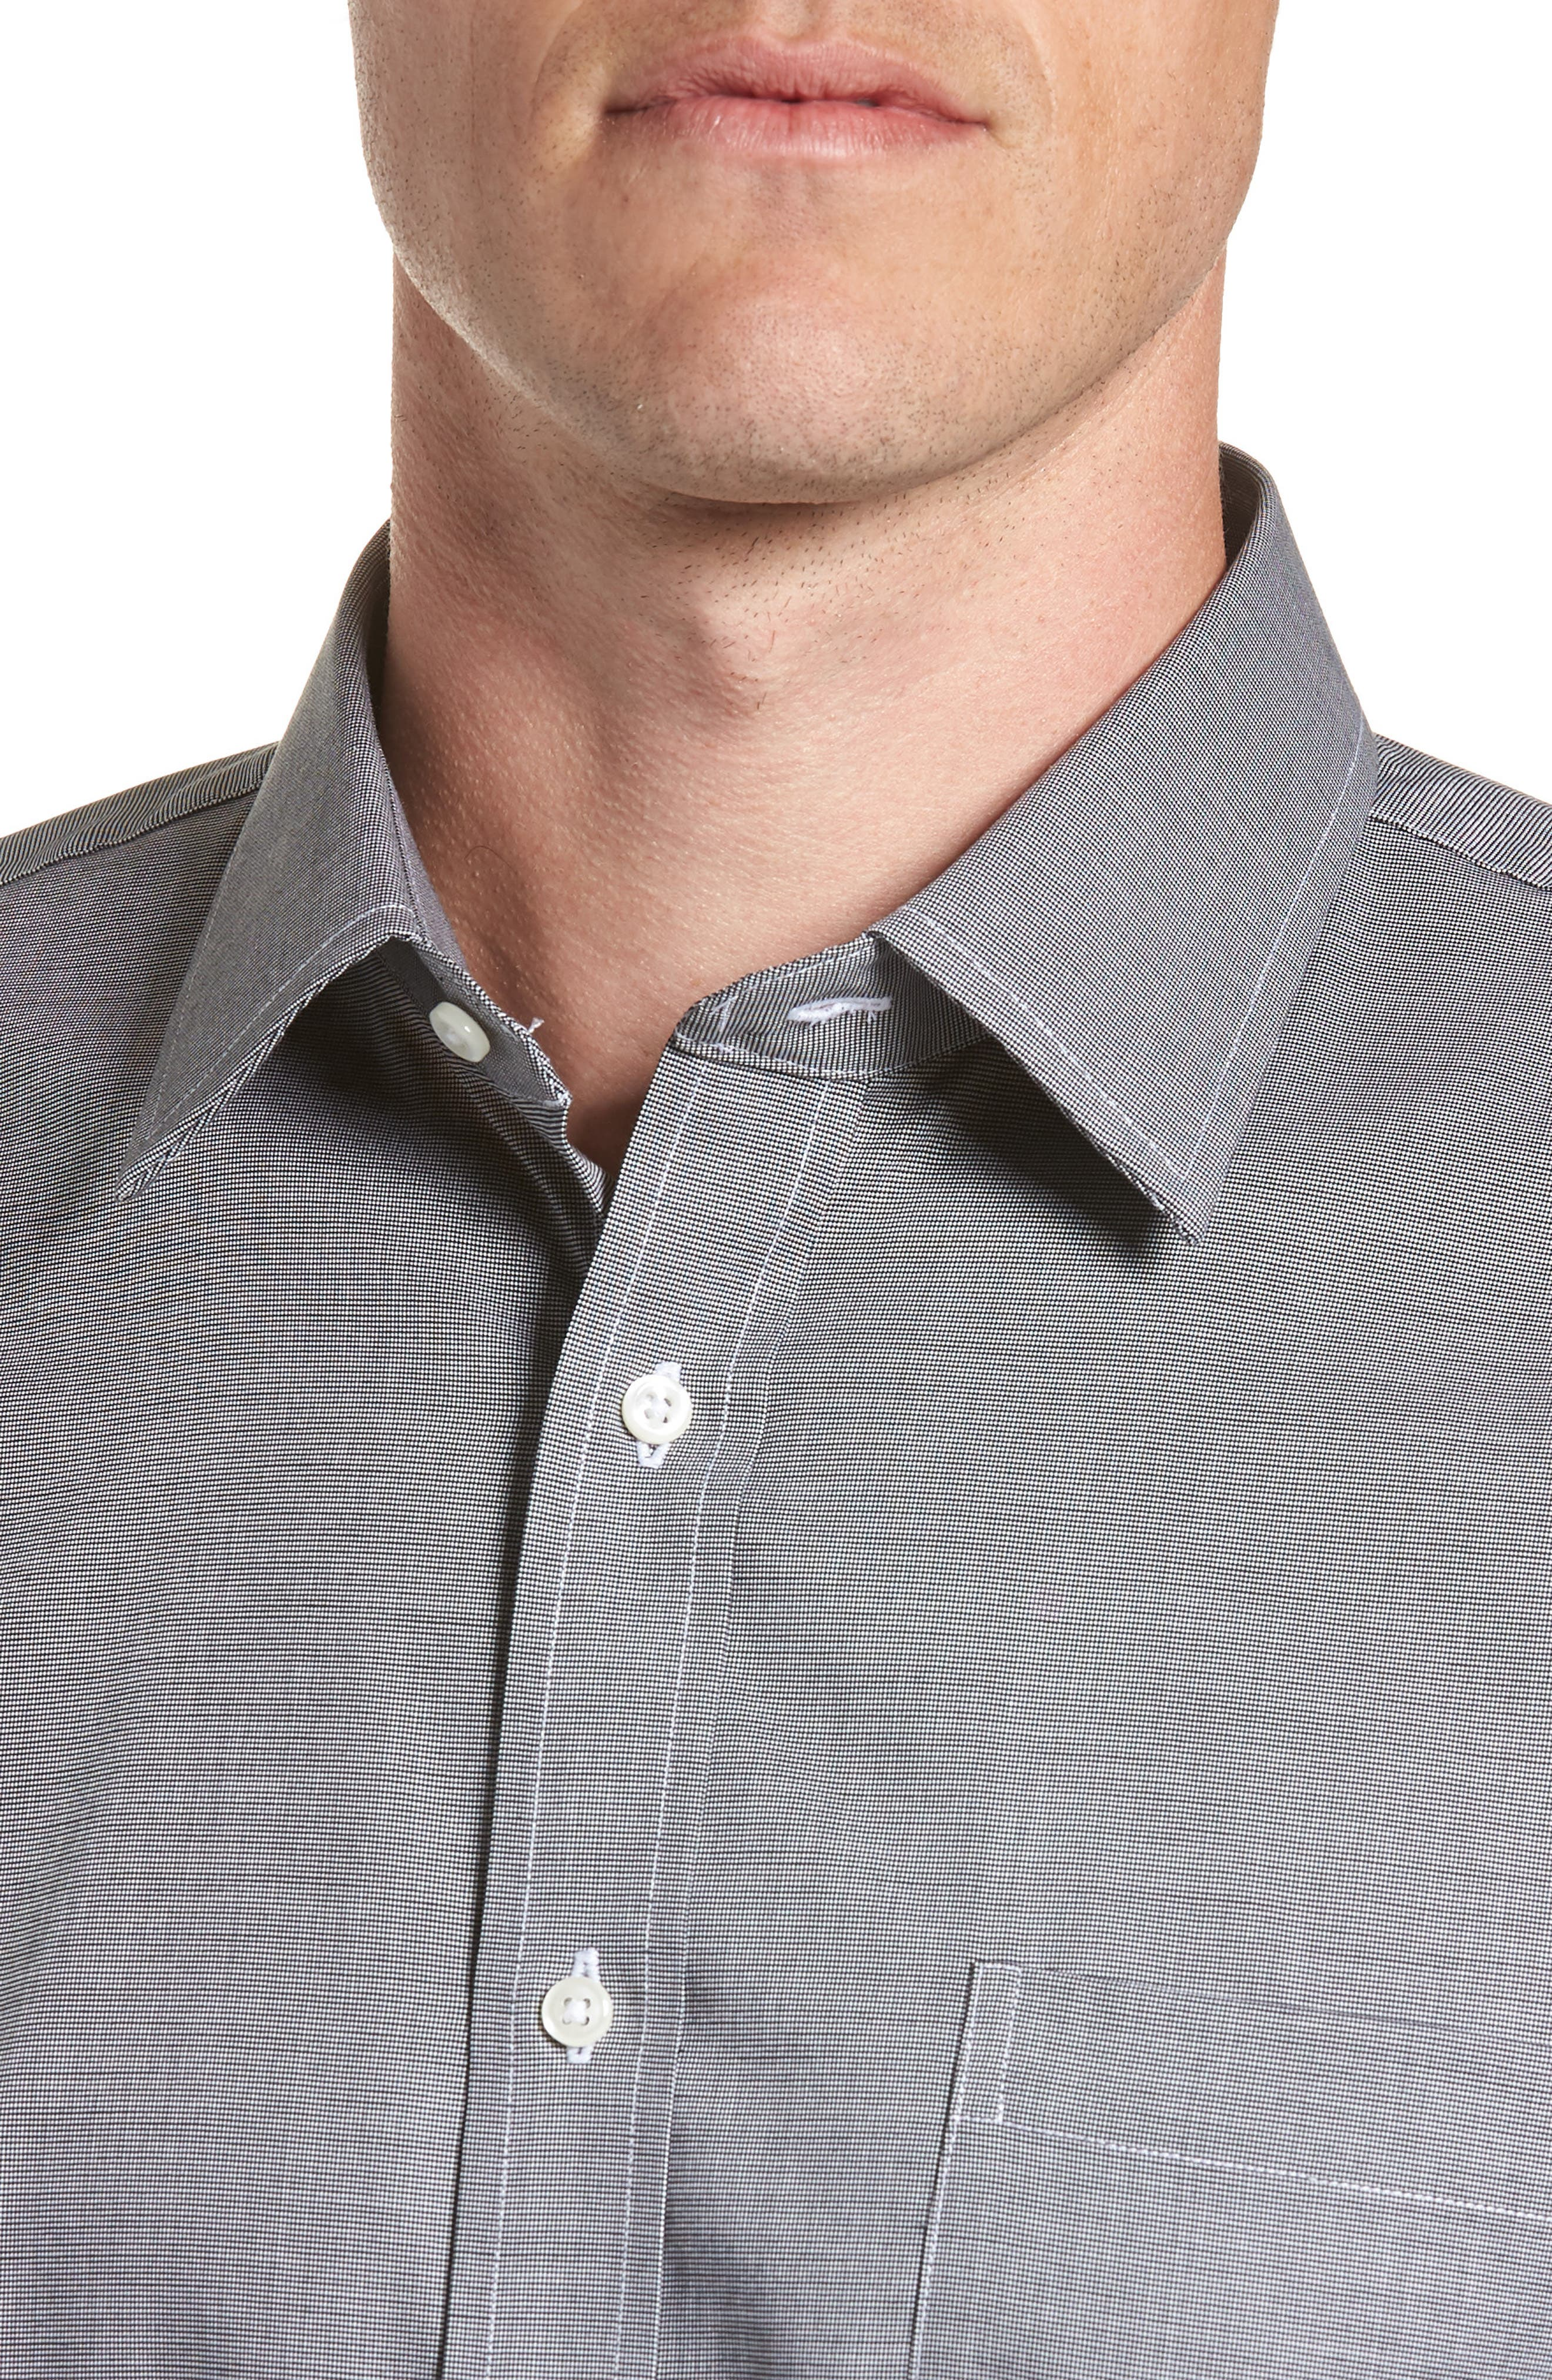 Trim Fit Non-Iron Dress Shirt,                             Alternate thumbnail 2, color,                             BLACK ROCK